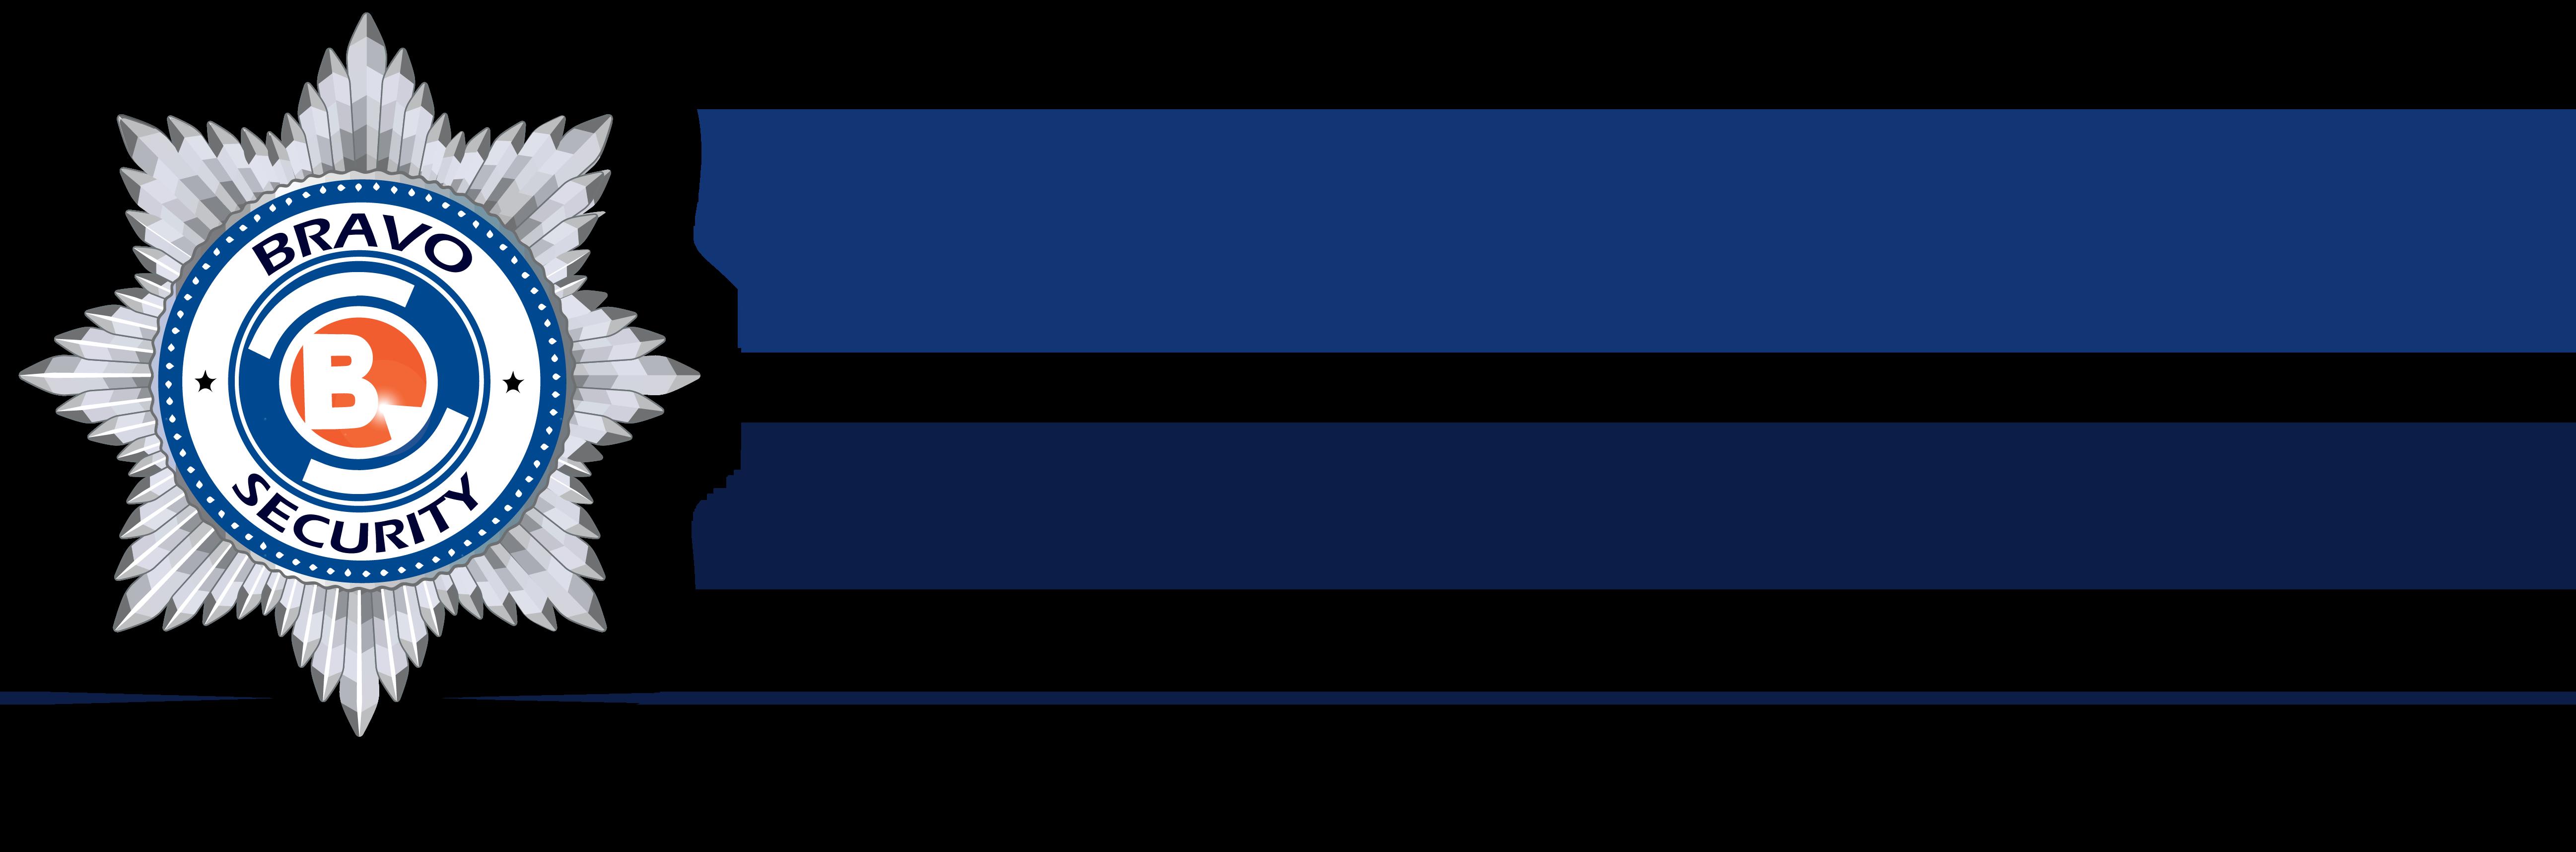 Bravo Security Ltd